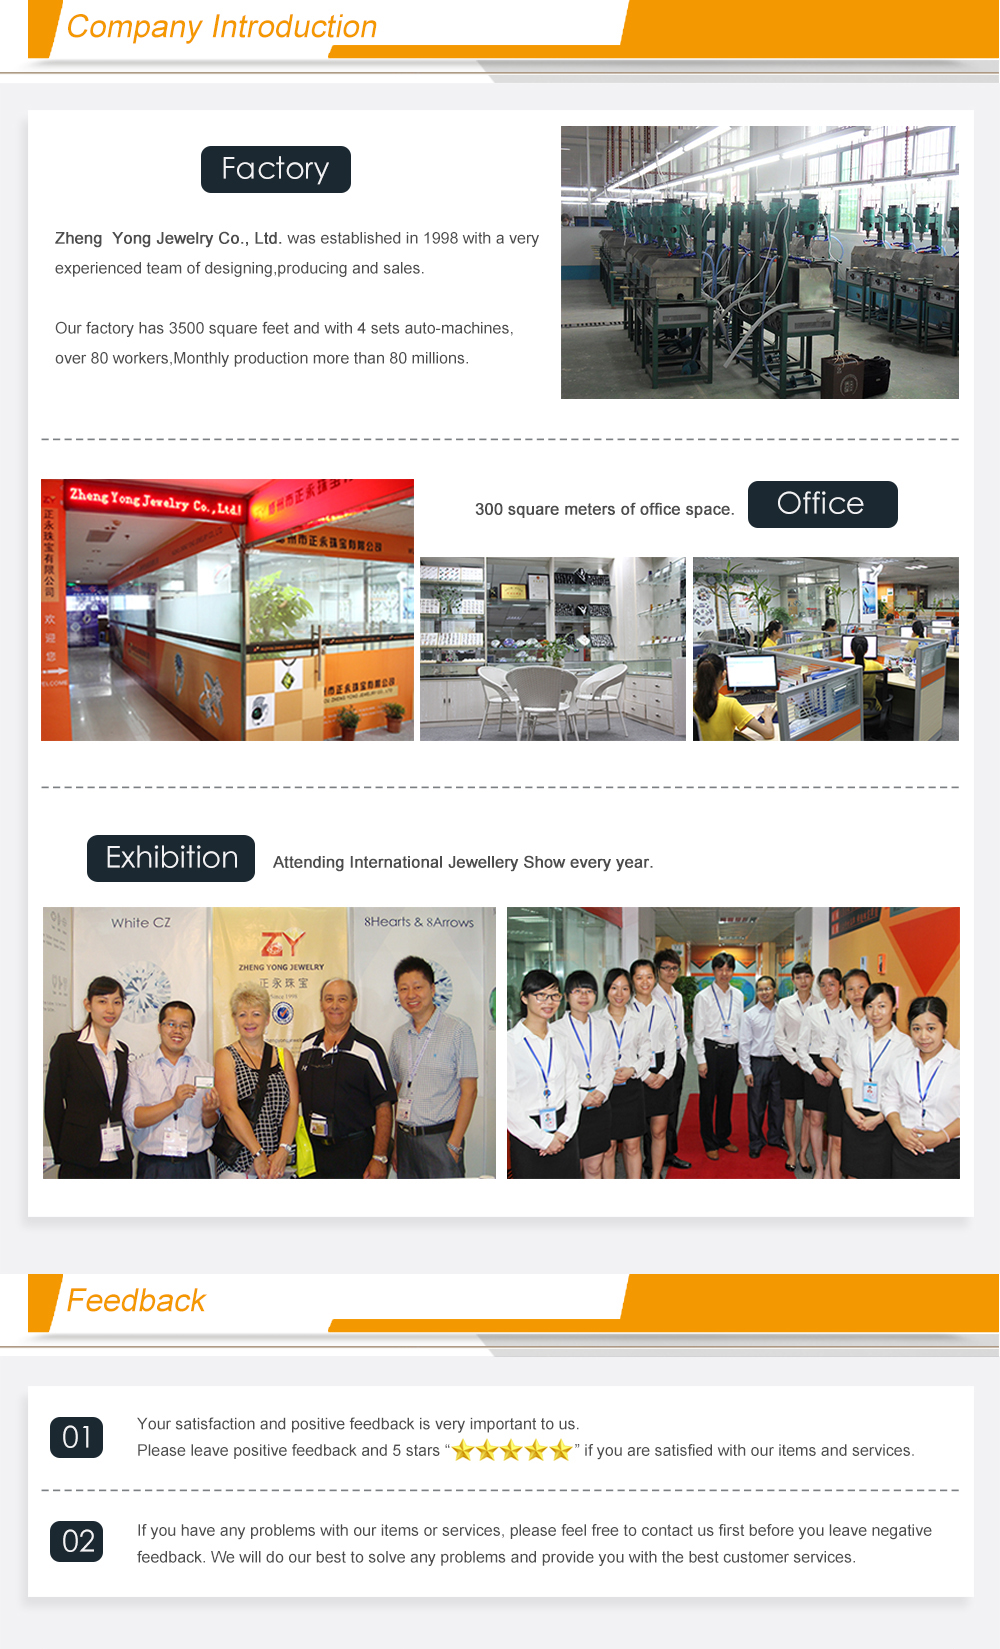 company + feedback + contact